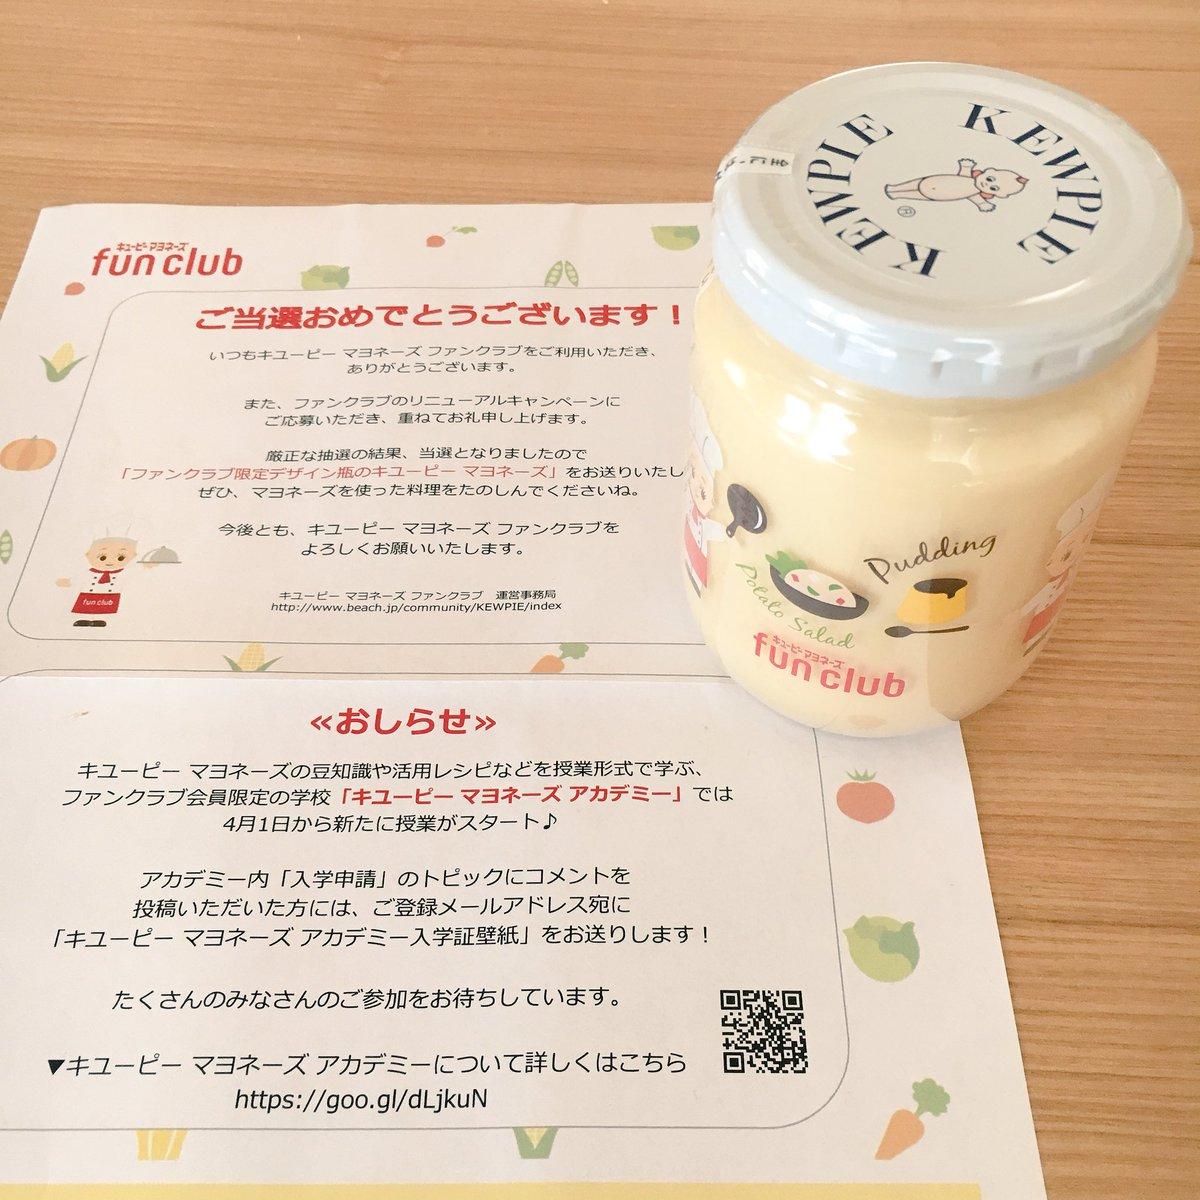 Tsubo Akane V Twitter ファンクラブのリニューアルキャンペーンにて ファンクラブ限定デザイン瓶のキューピー マヨネーズ に当選 マヨネーズはキューピーがお気に入り 瓶のデザインにもあるけど プリン作りにも使えるそうです キューピーマヨネーズファン